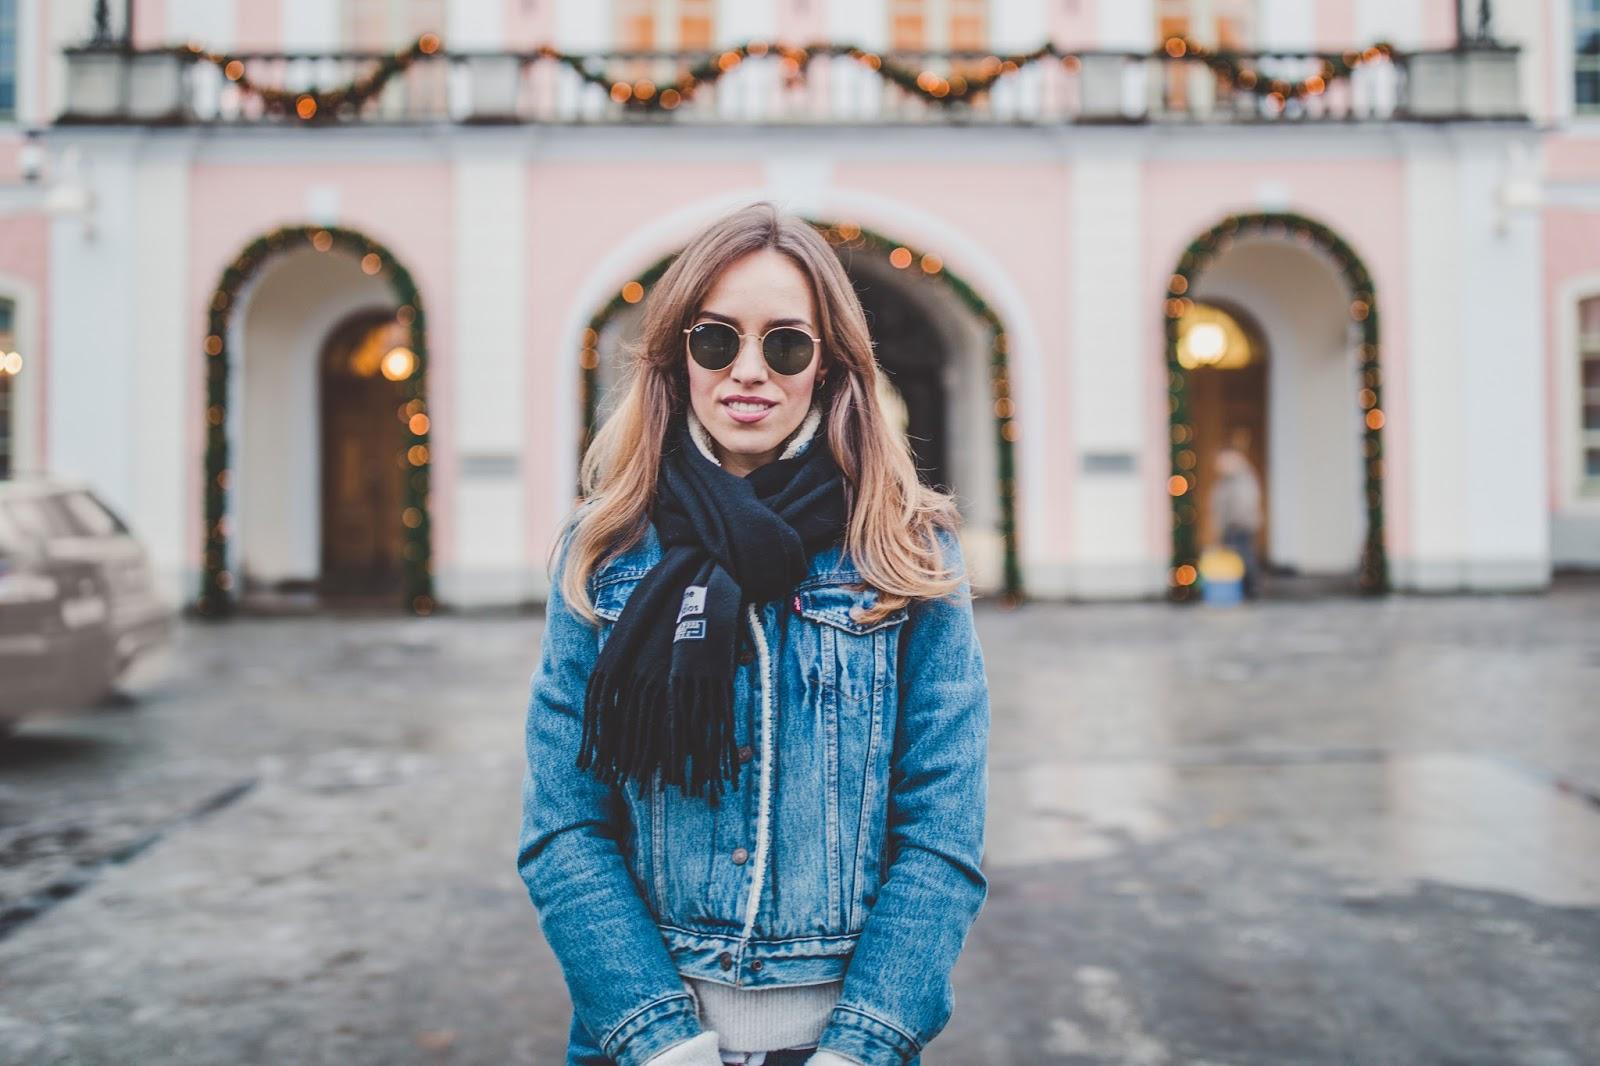 levis sherpa jacket acne black scarf ray ban sunglasses